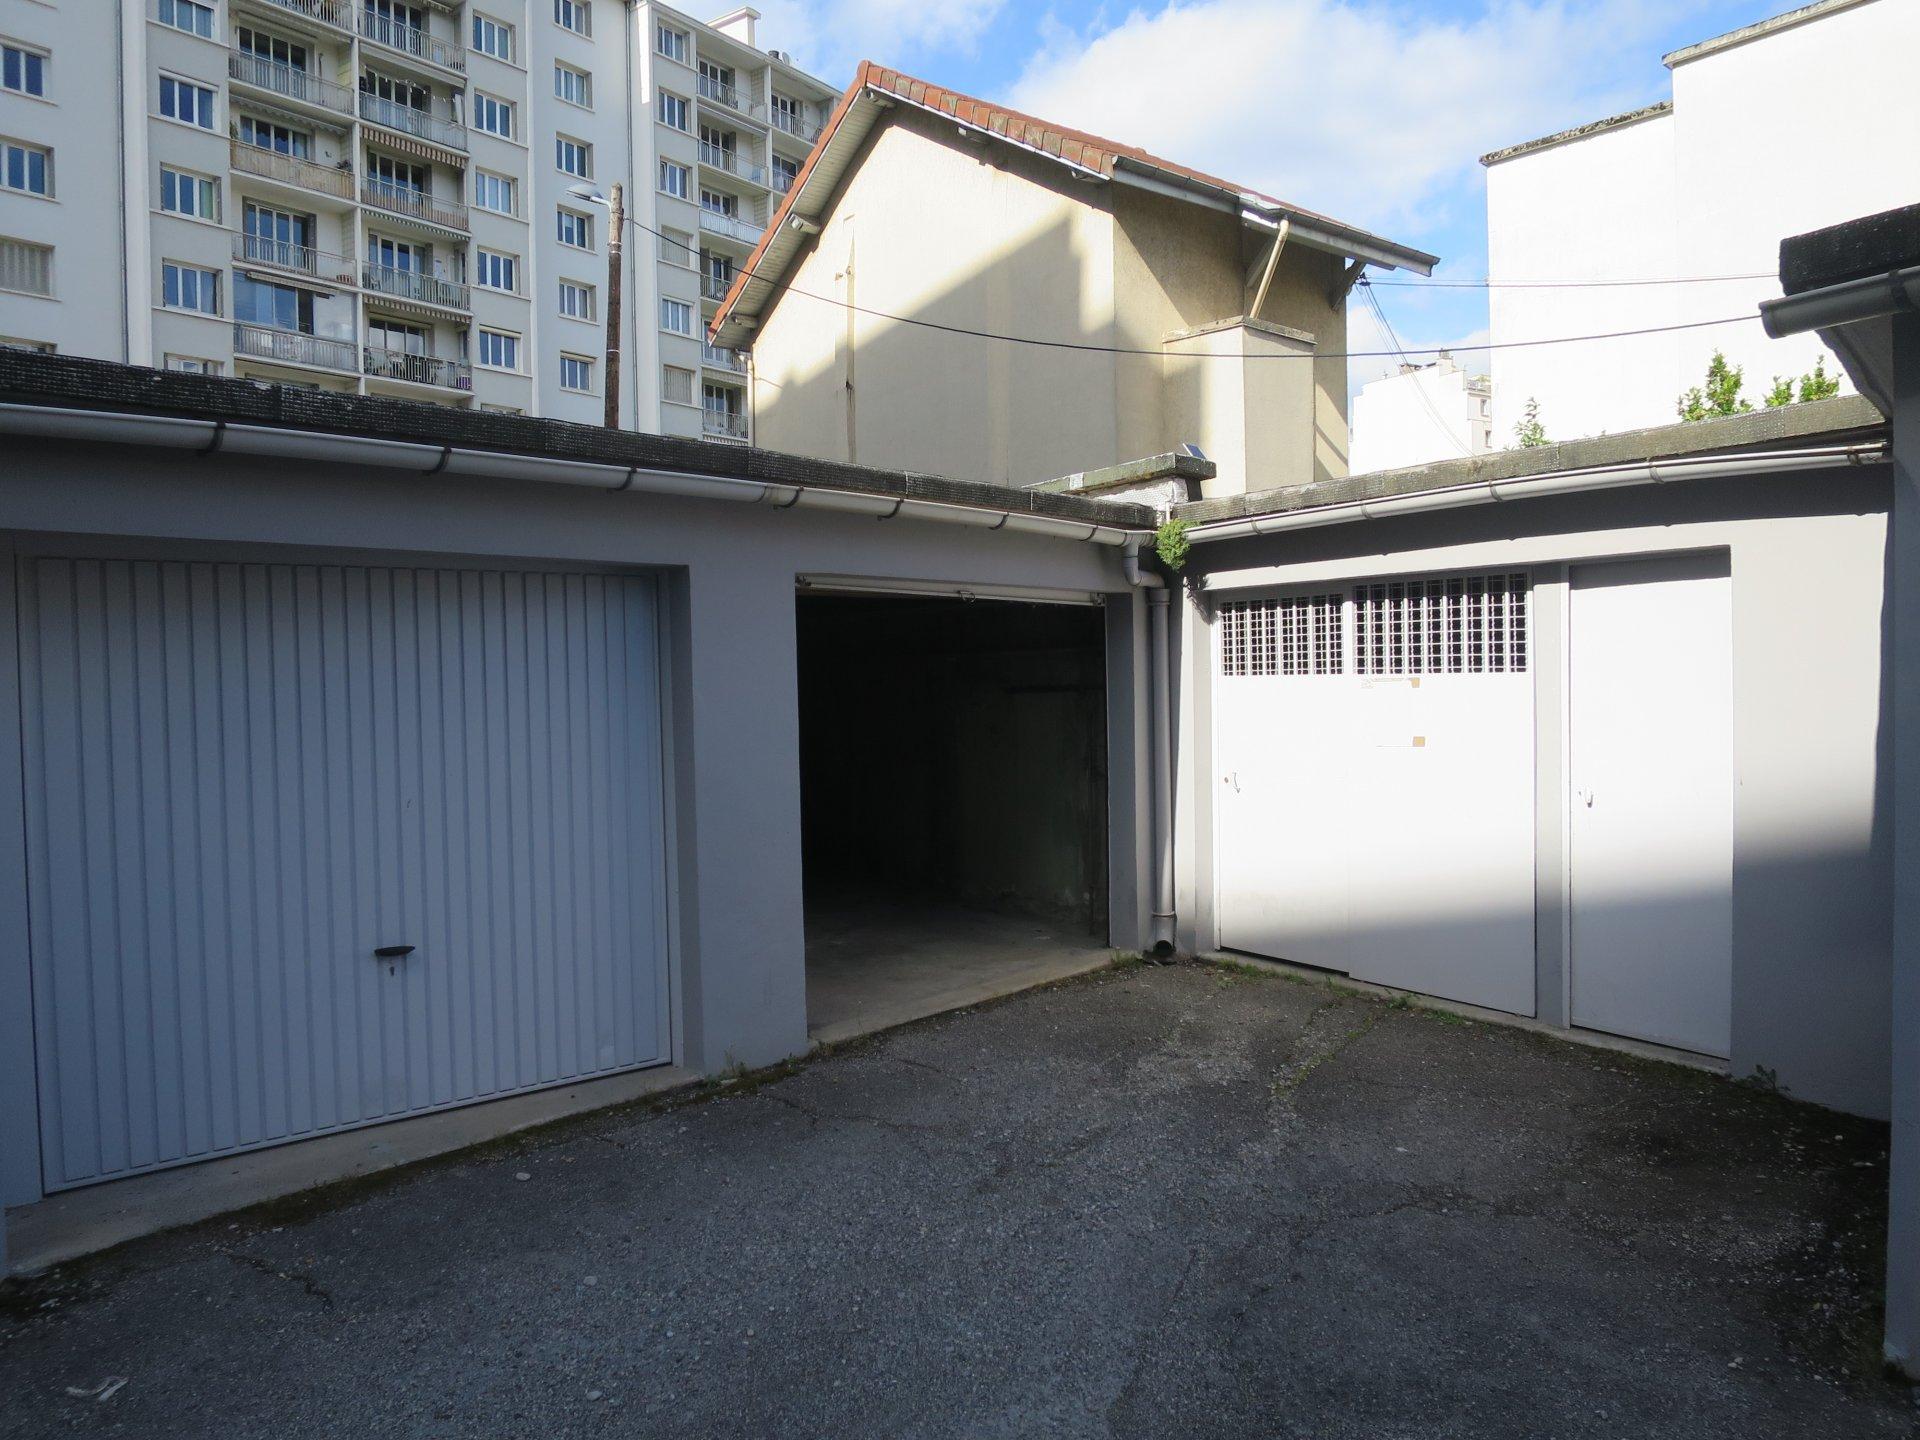 Rental Carpark - Grenoble Grands Boulevards